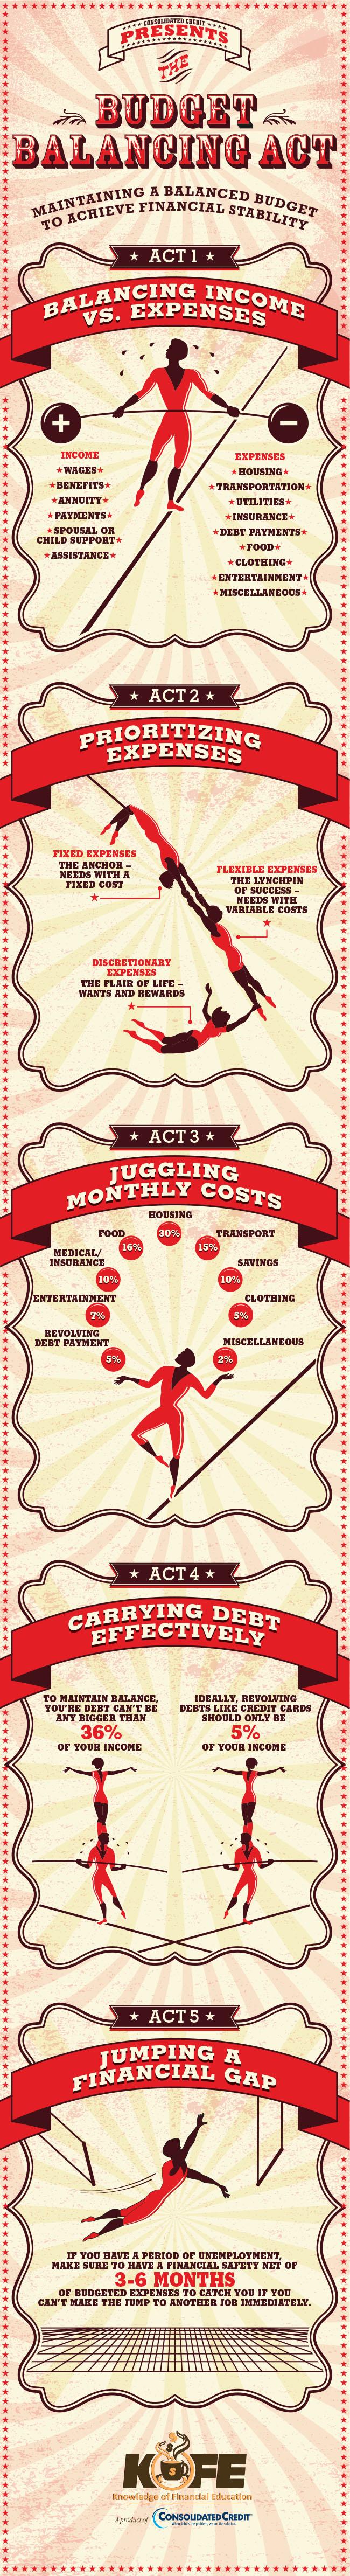 Budget Balancing Act infographic